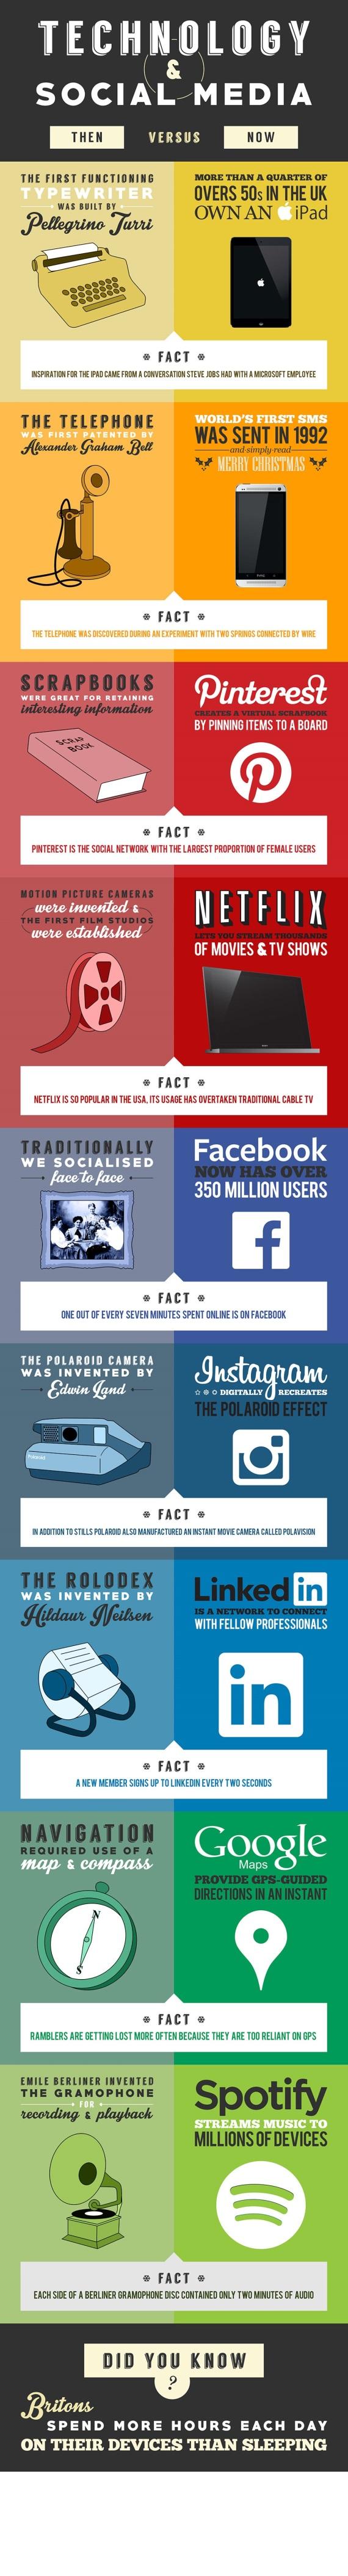 tech-social-infographic-v6